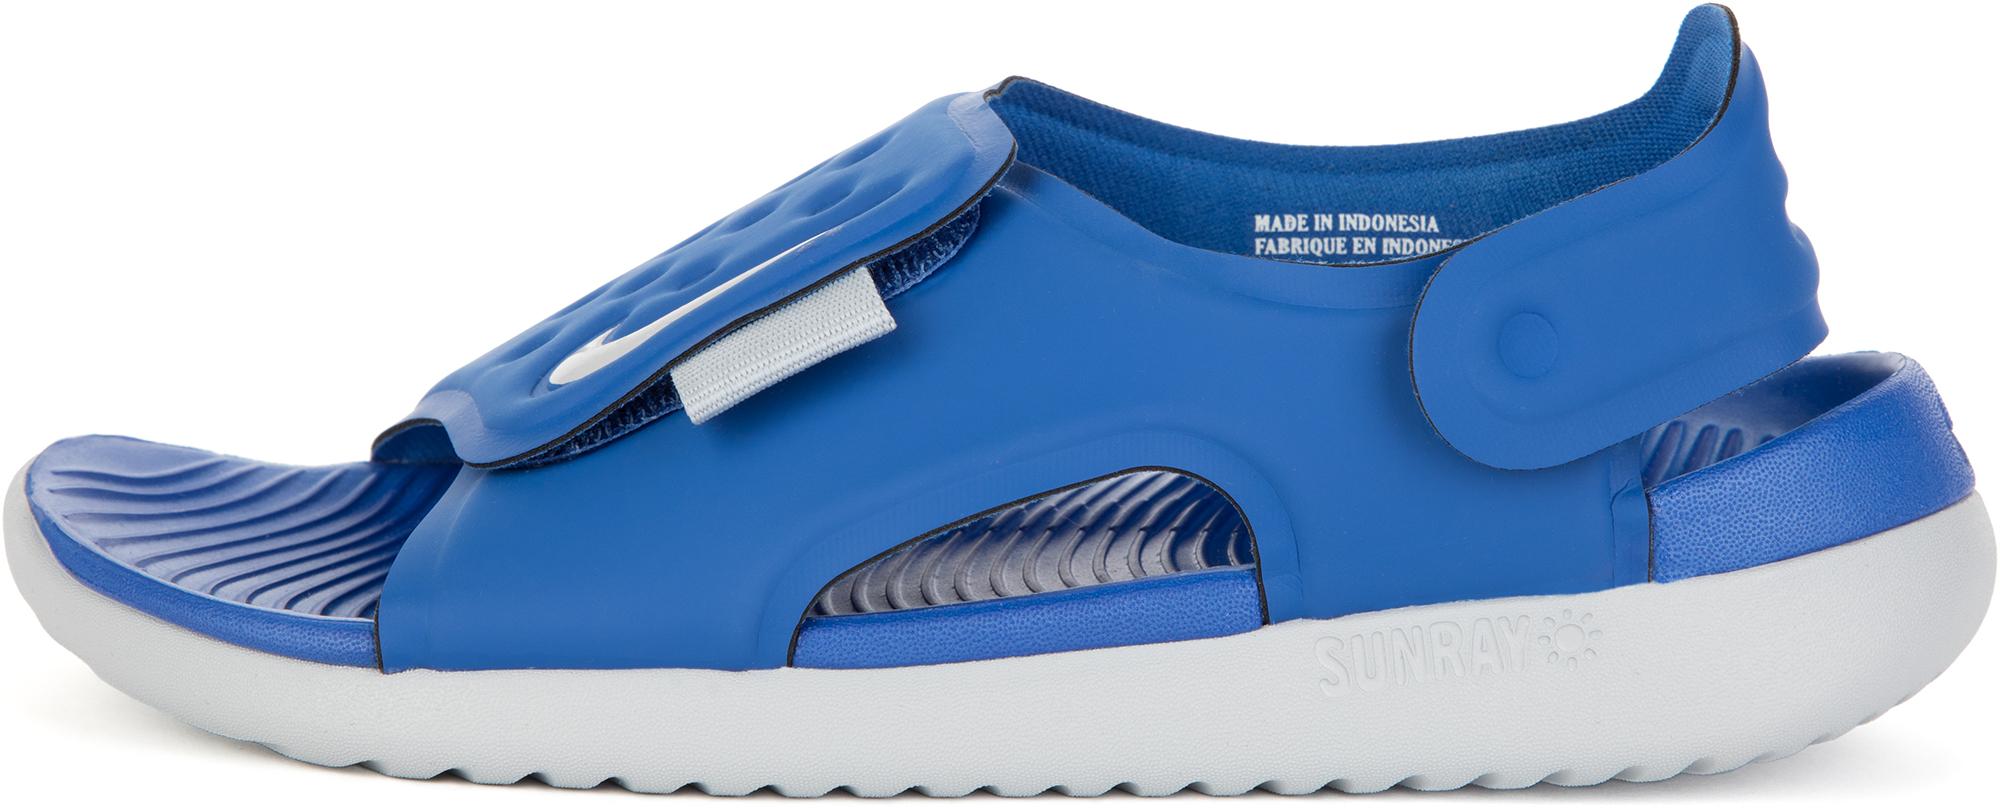 Nike Сандалии для мальчиков Nike Sunray Adjust 5, размер 28.5